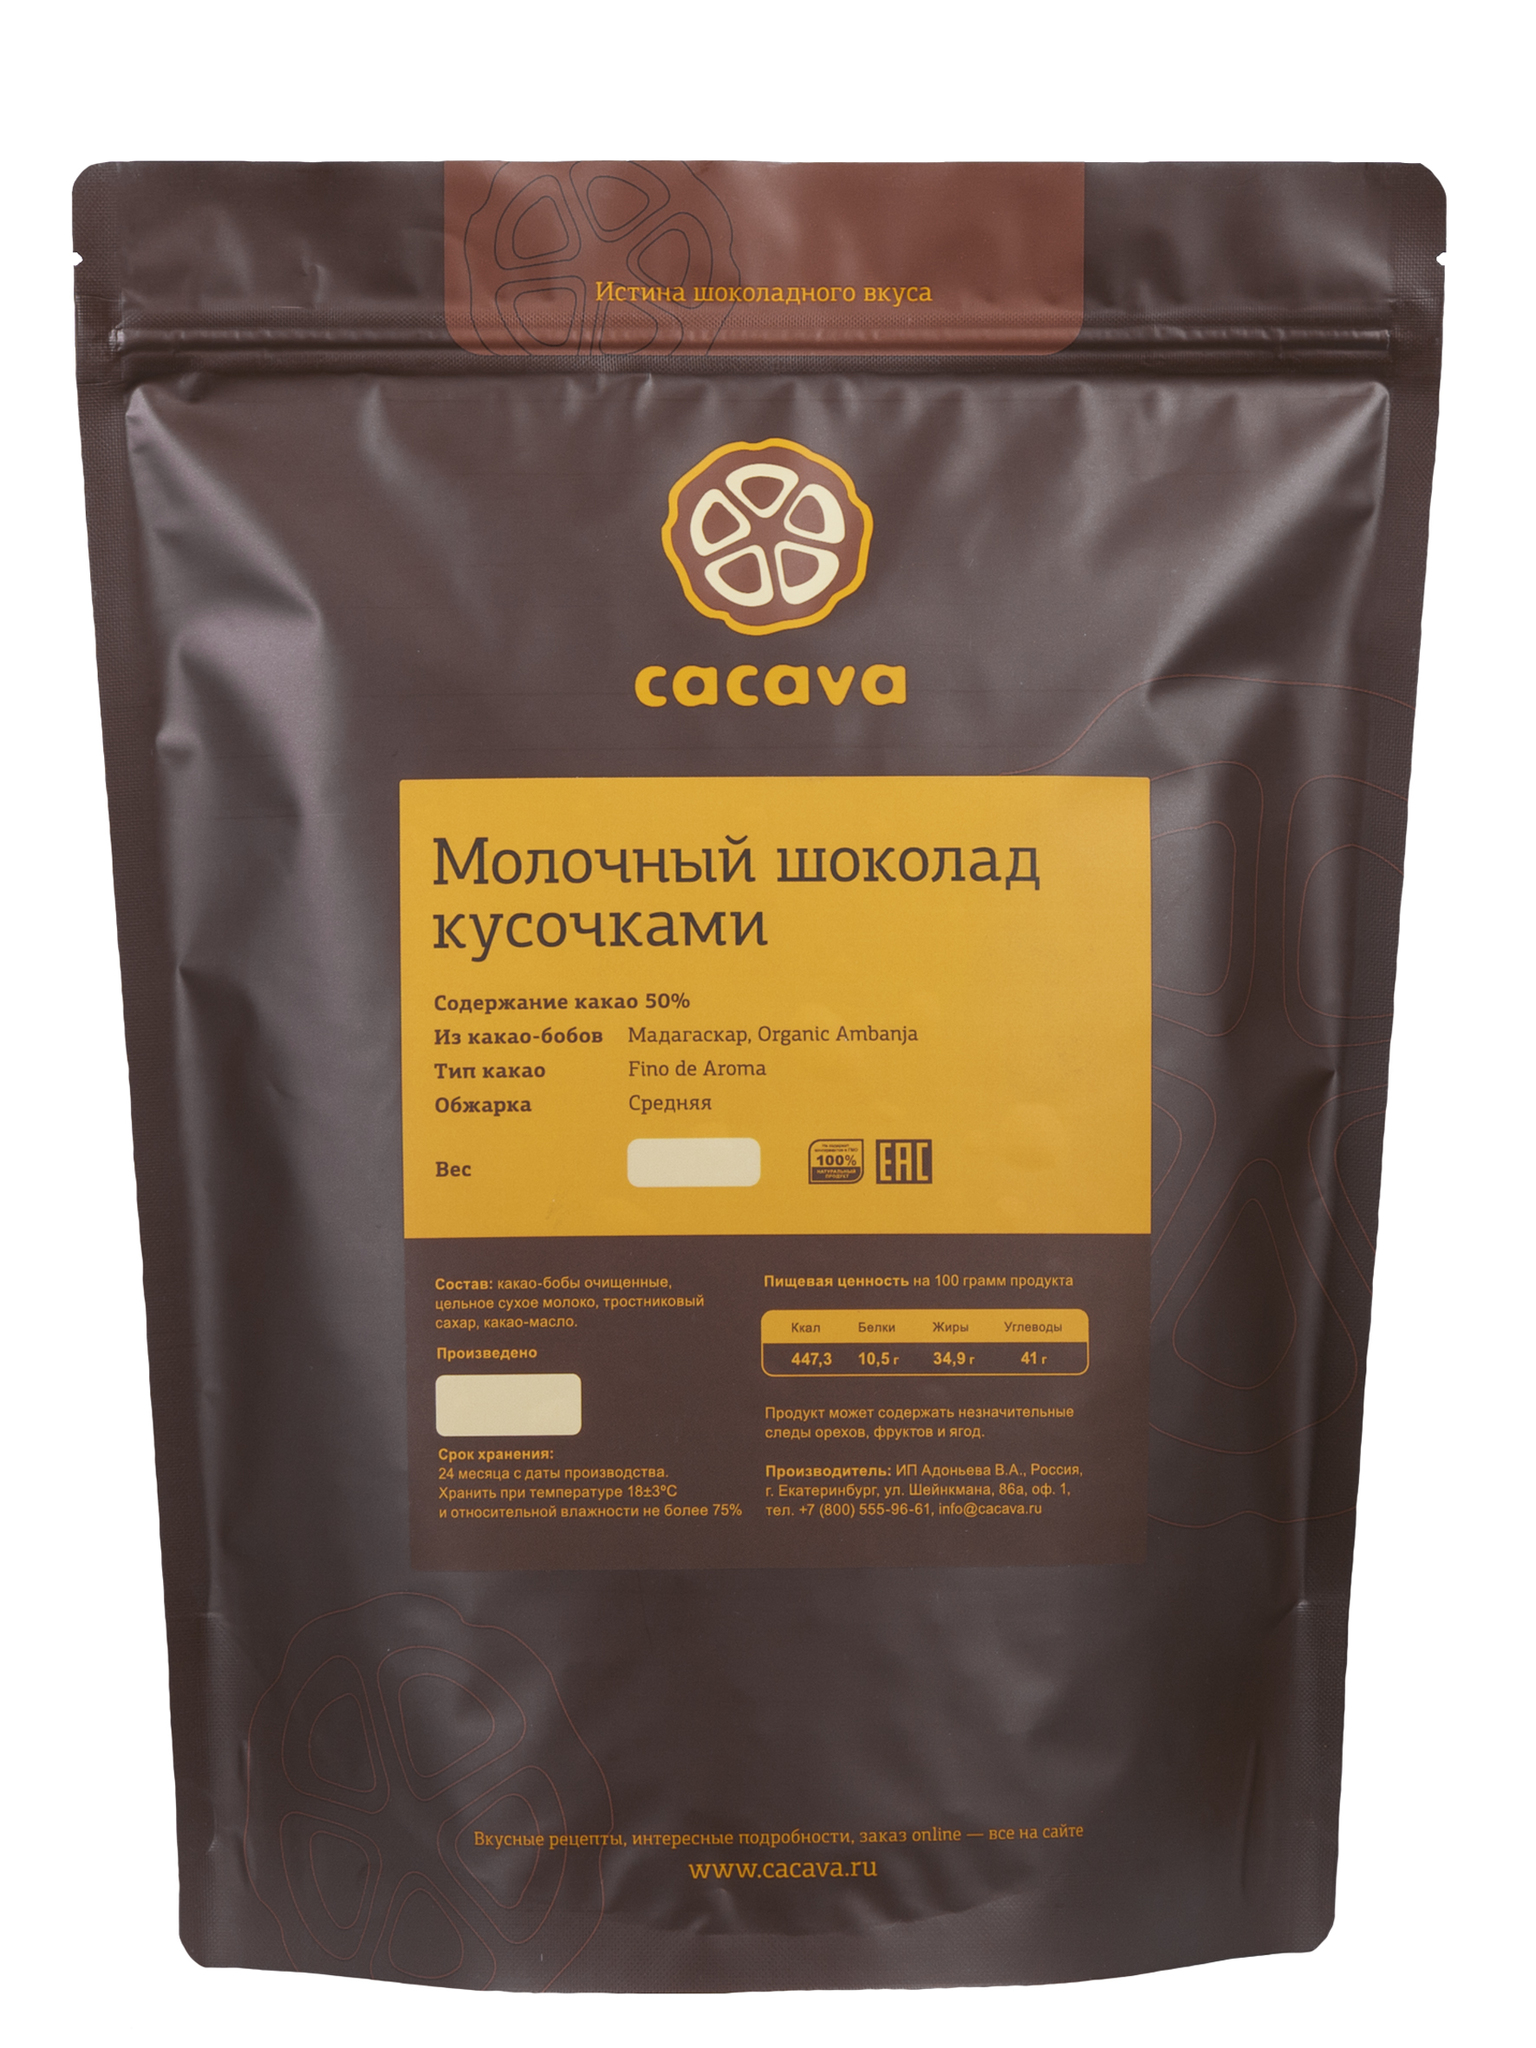 Молочный шоколад 50 % какао (Мадагаскар), упаковка 1 кг